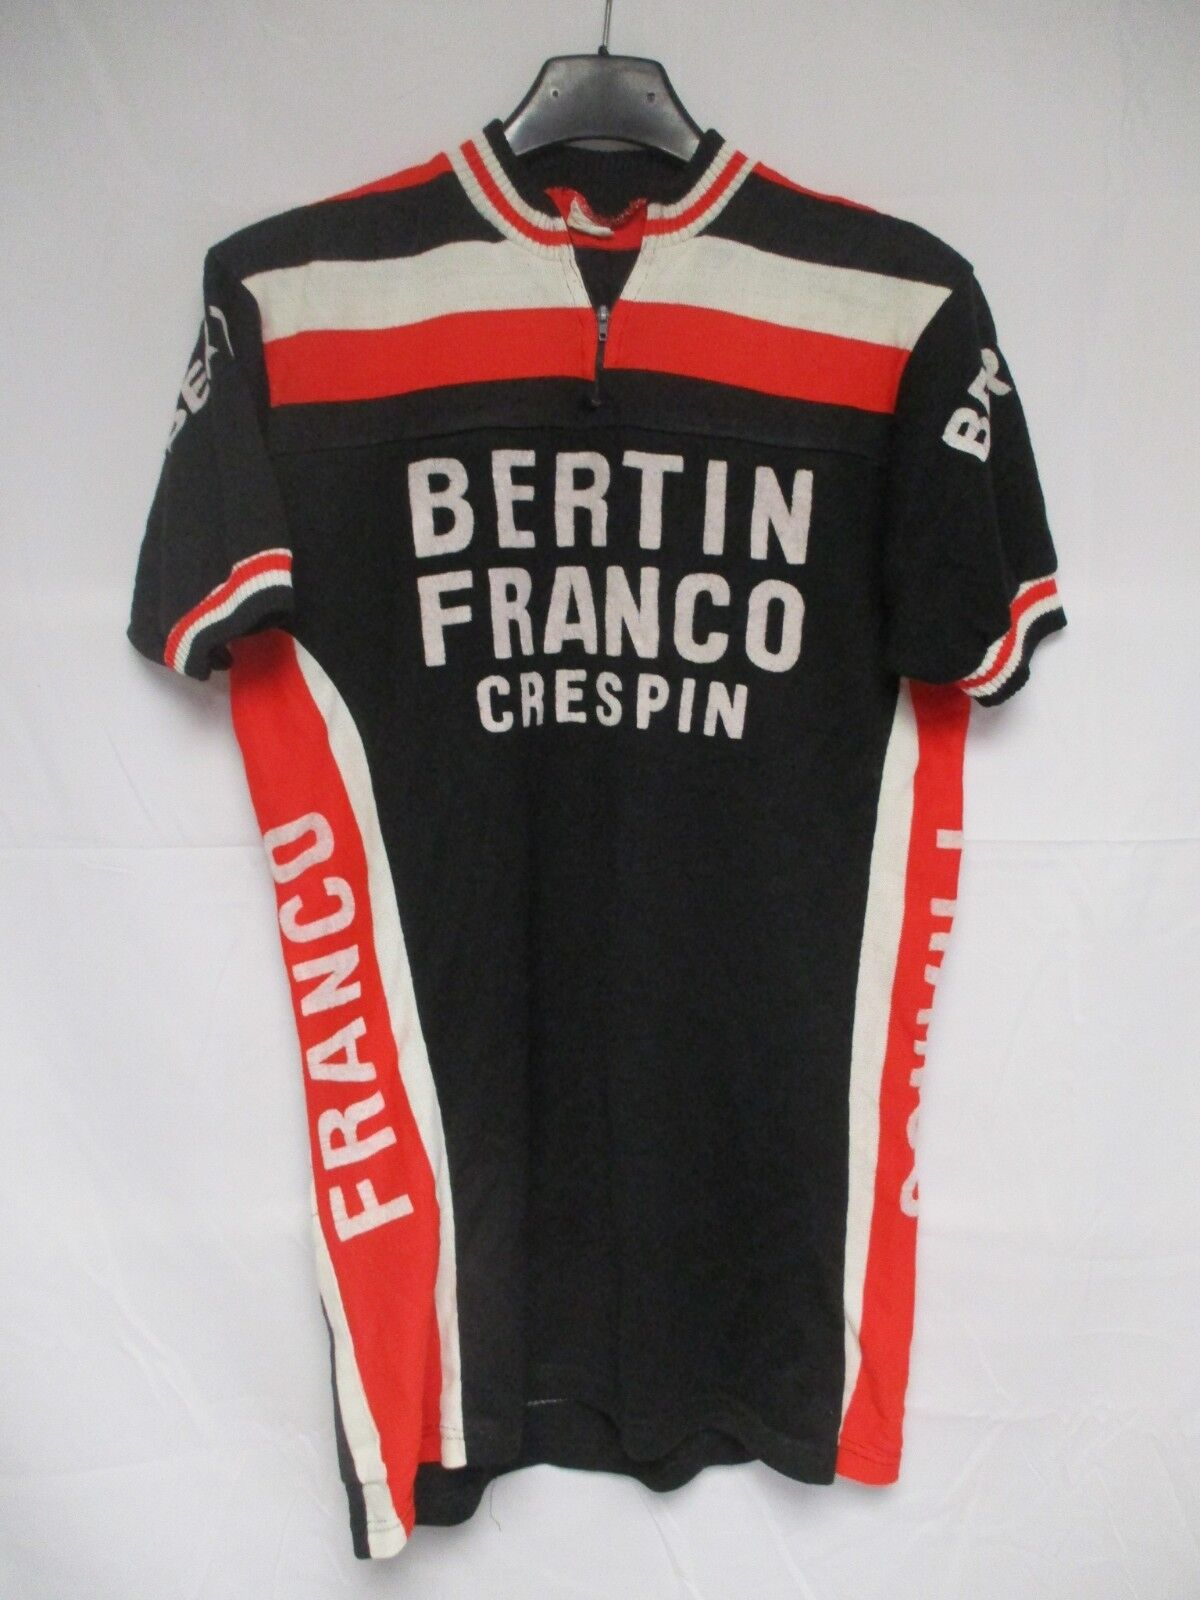 Maillot cycliste BERTIN FRANCO CRESPIN vintage shirt trikot jersey 70's maglia M